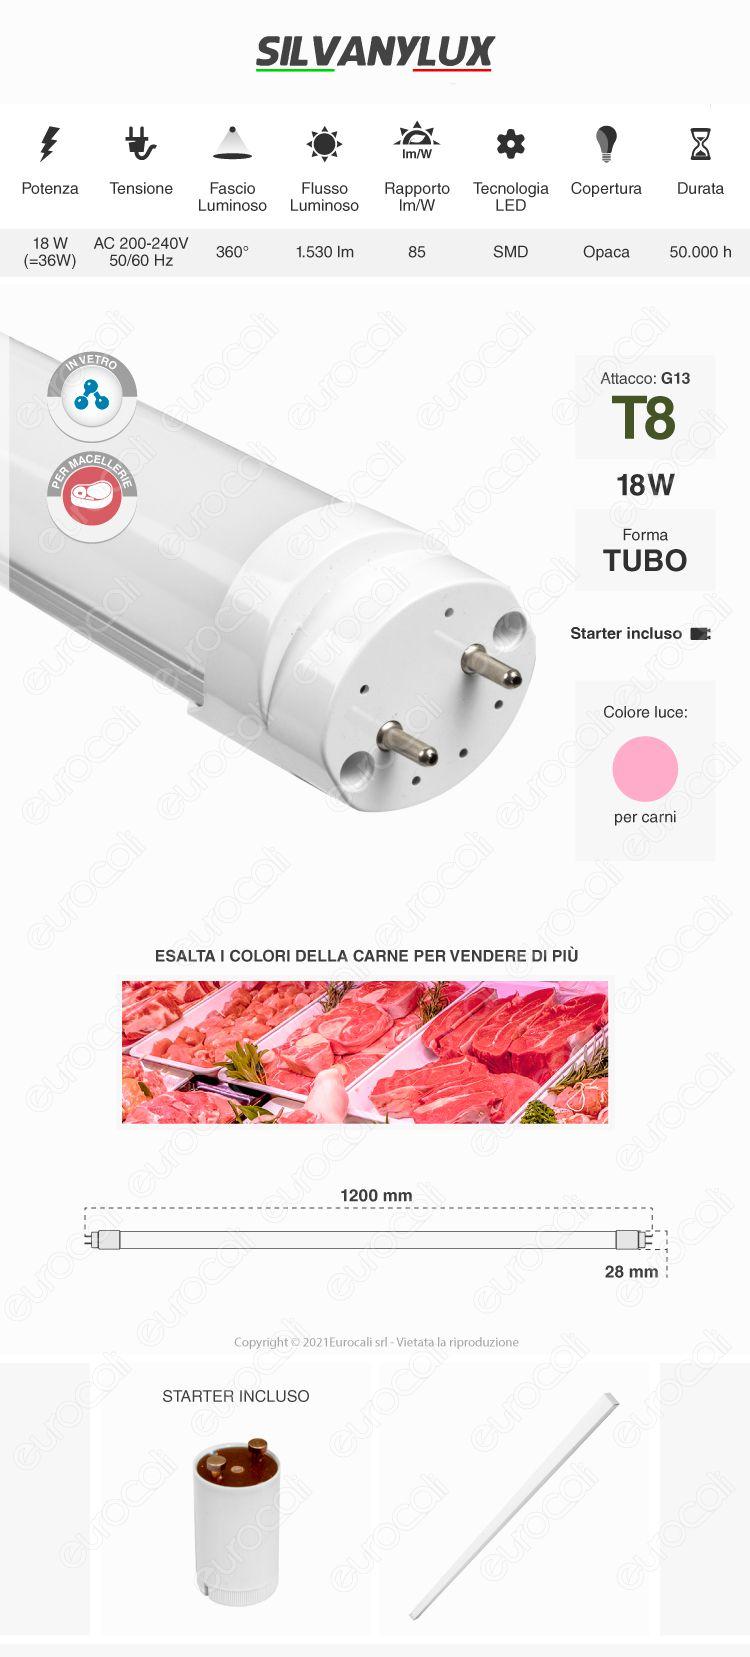 Tubo led t8 g13 Silvanylux